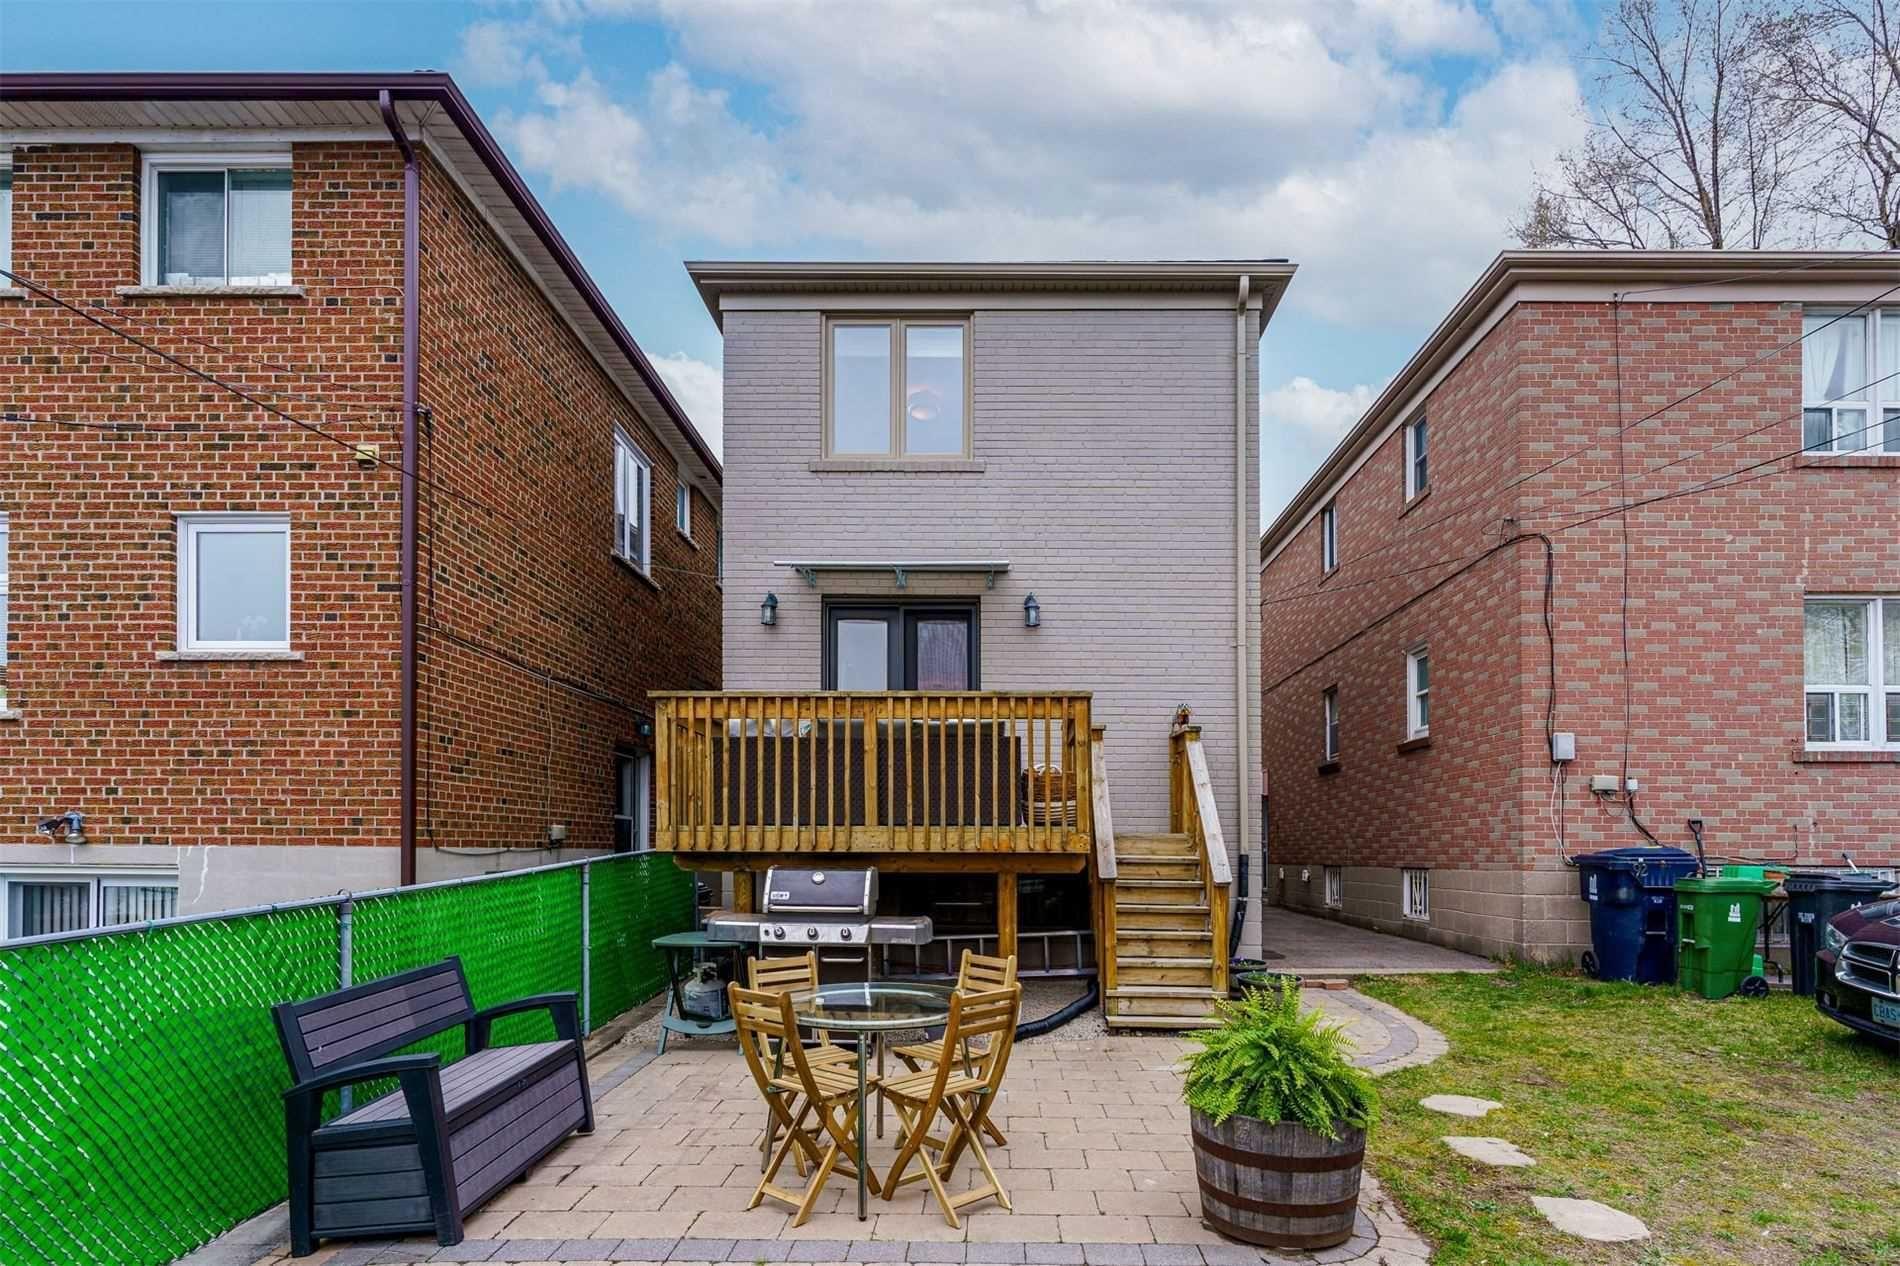 Photo 35: Photos: 92 Holborne Avenue in Toronto: Danforth Village-East York House (2-Storey) for sale (Toronto E03)  : MLS®# E5204452